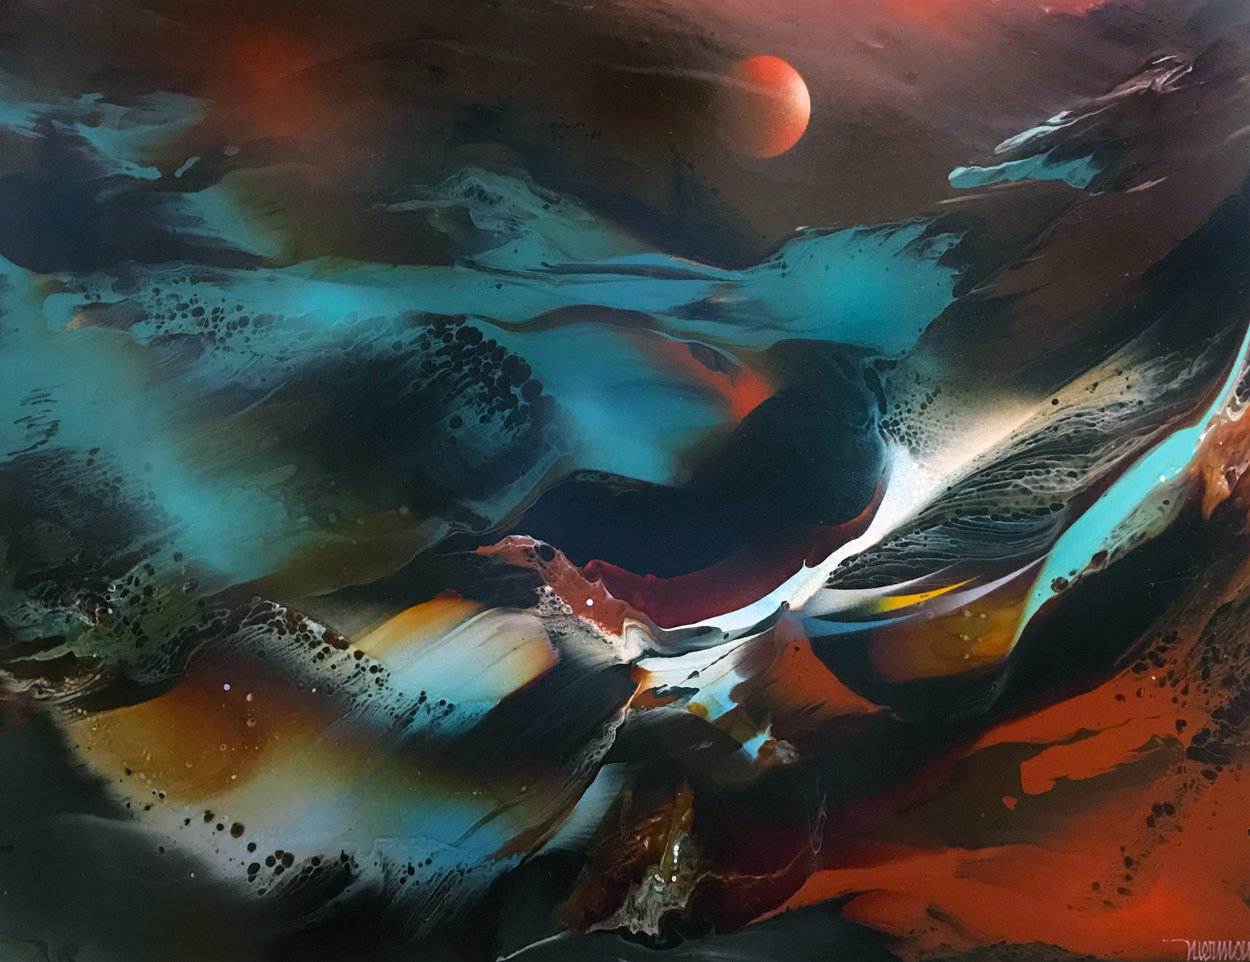 Imaginary Landscape 30x38 Original Painting by Leonardo Nierman